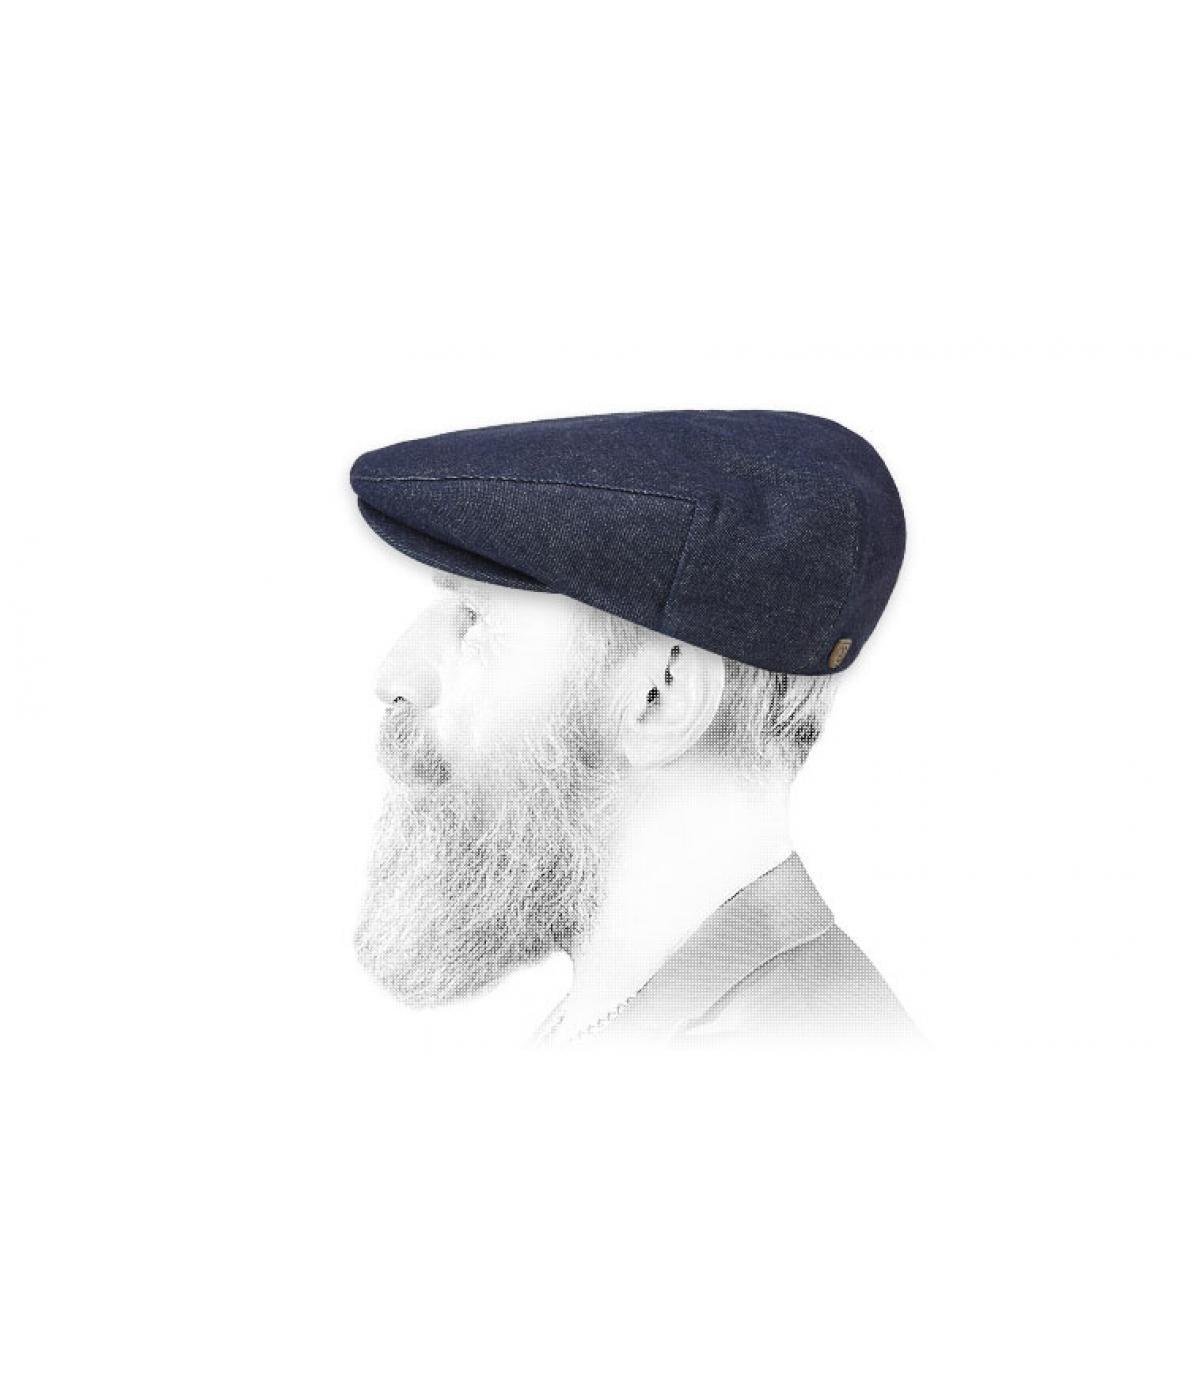 jean Brixton baret